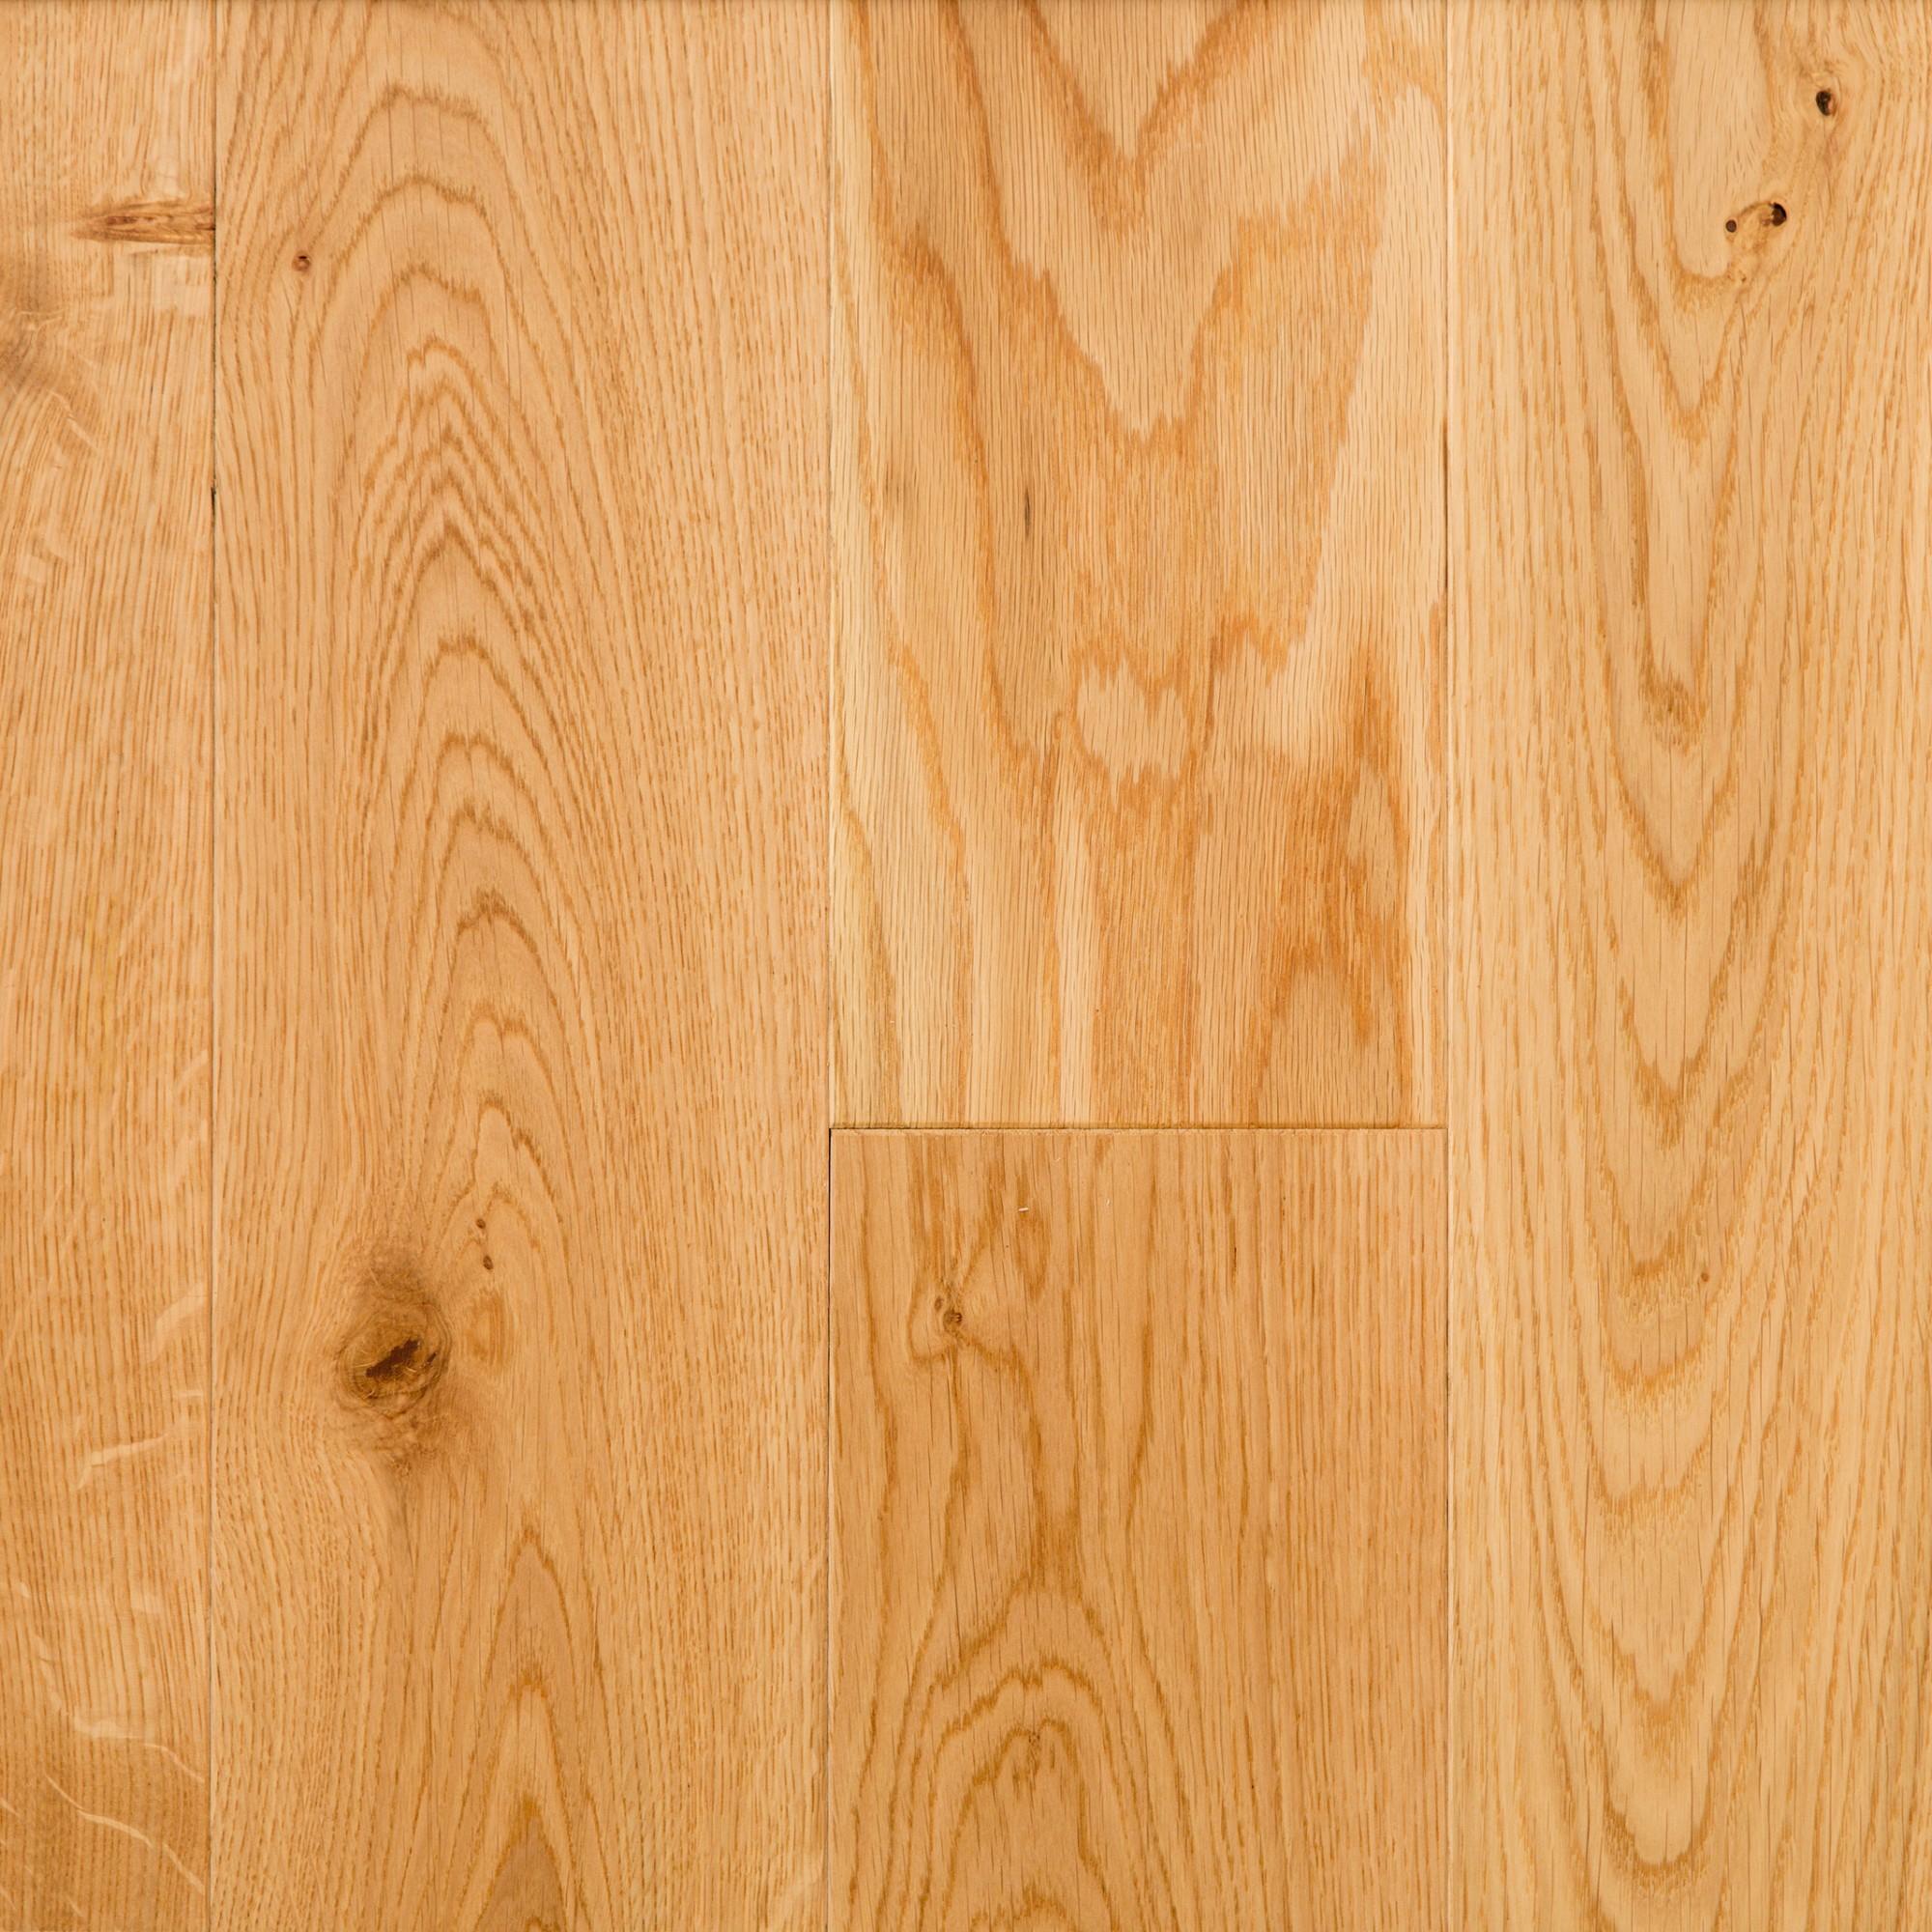 Smooth White Oak Natural Vintage Hardwood Flooring And